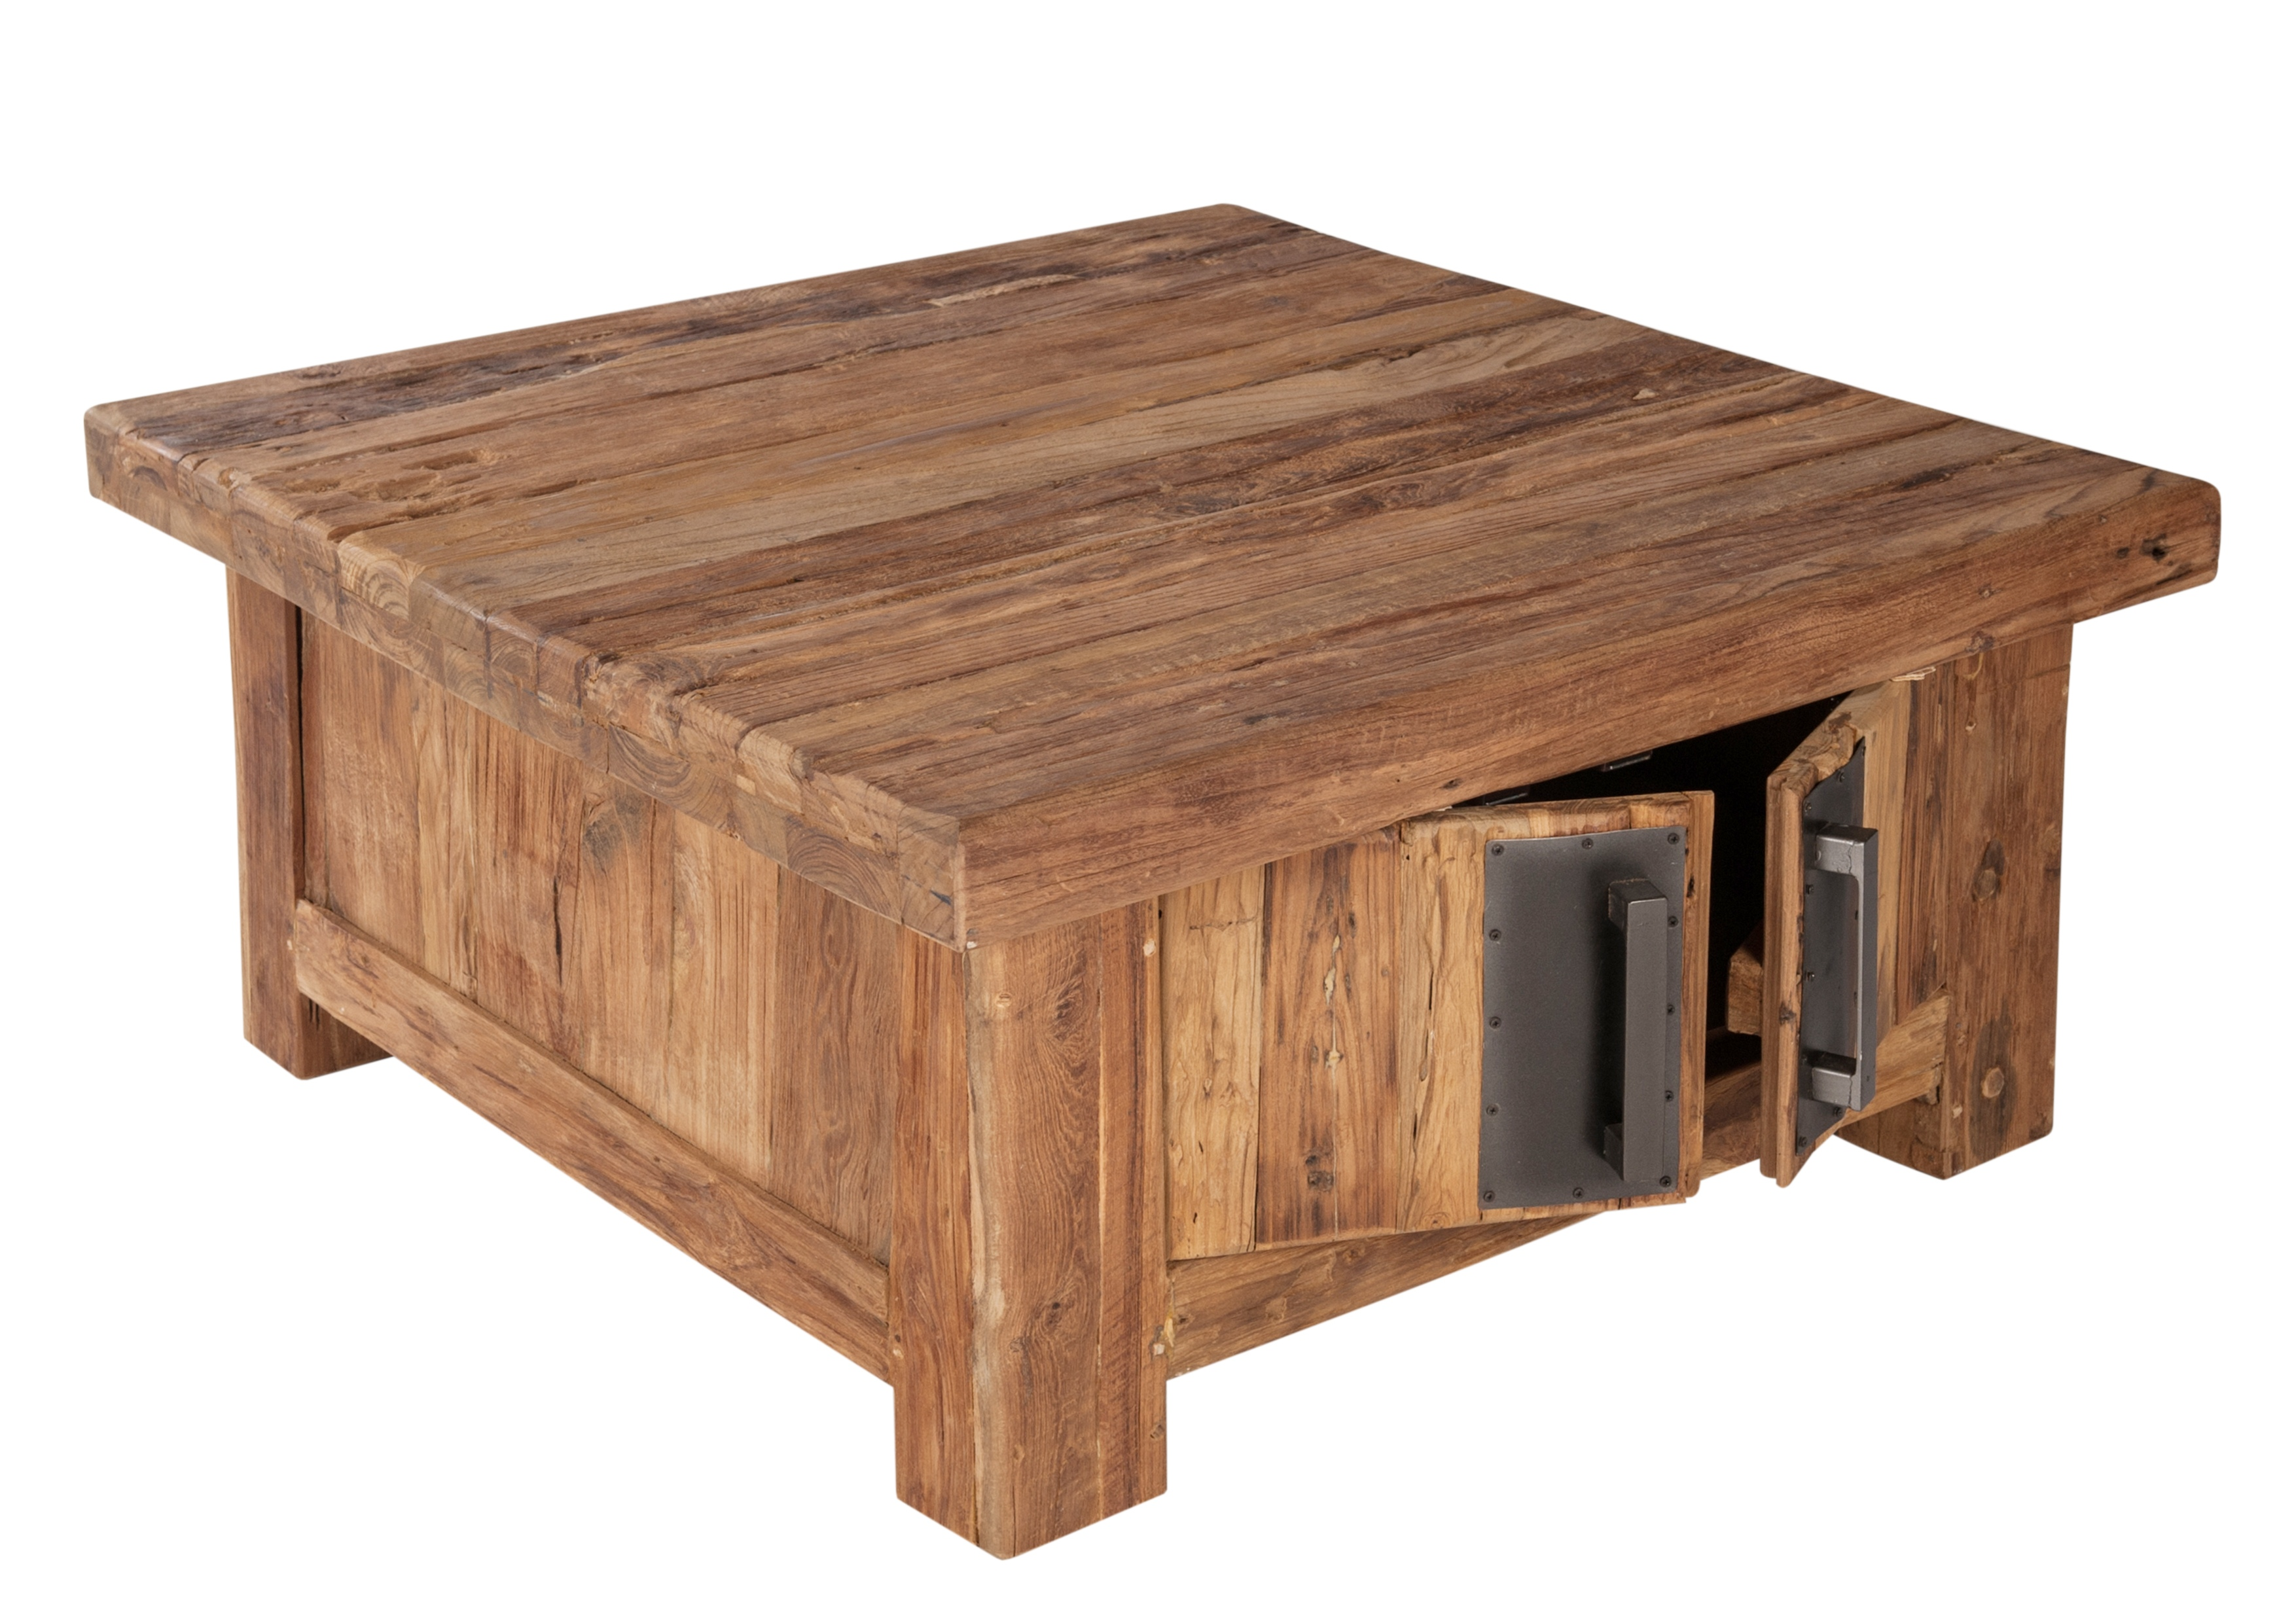 Sit Couchtischtruhe Teakholz Coral mit Türen